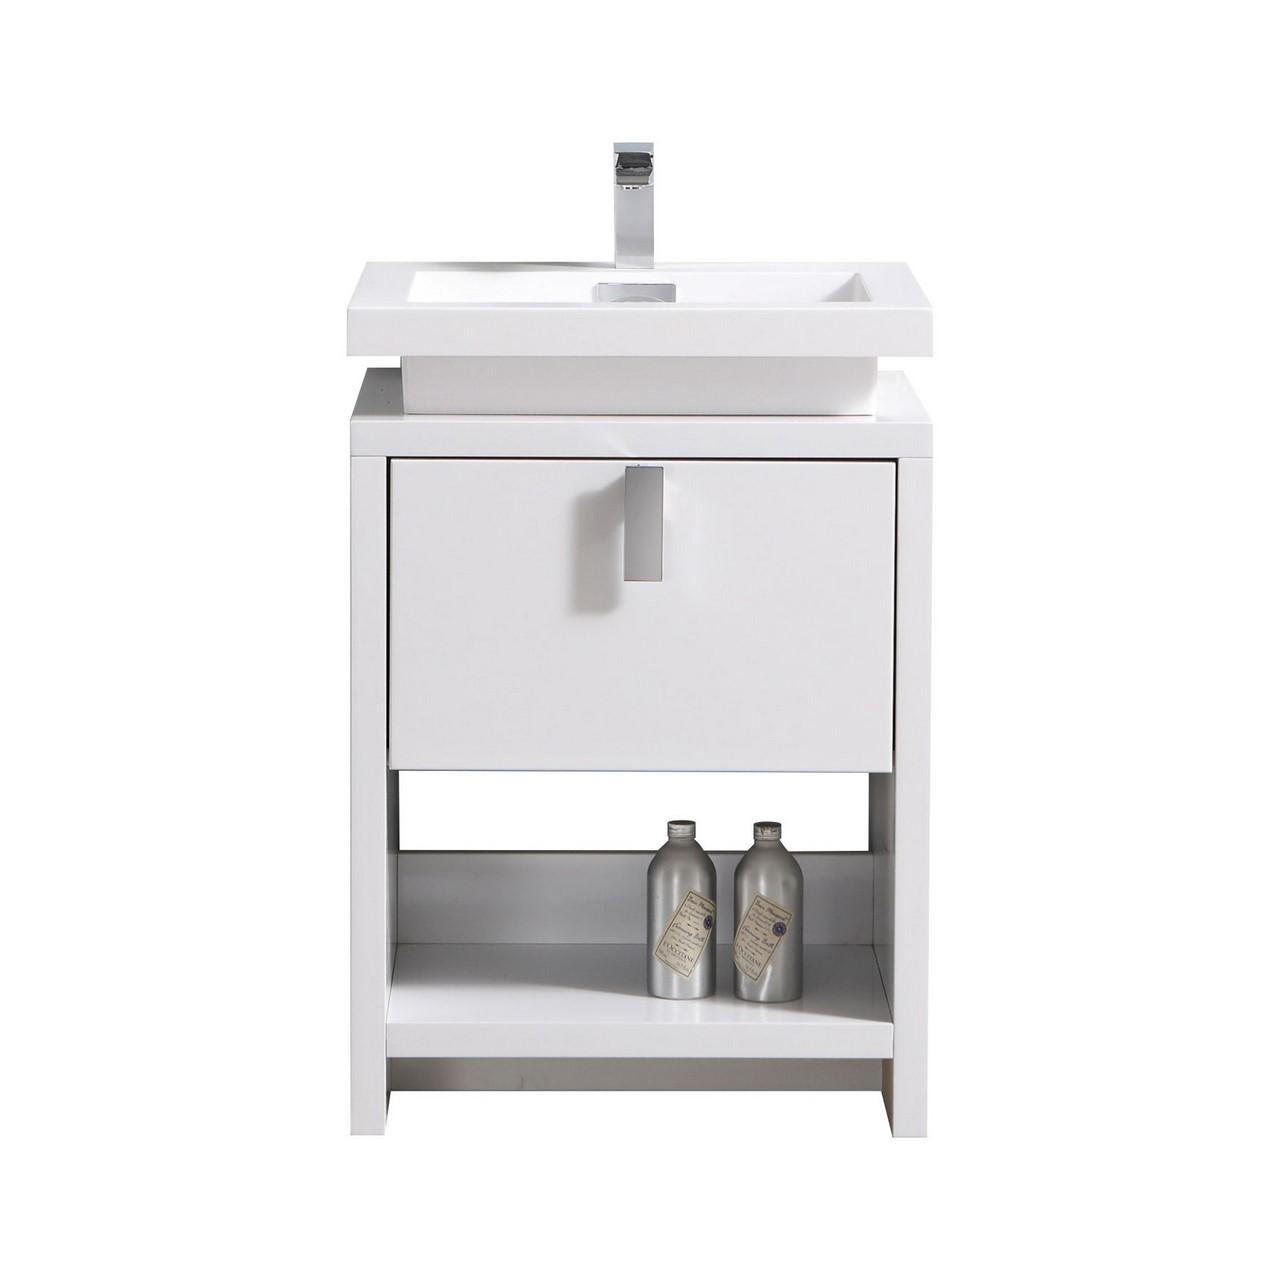 "Levi 24"" High Gloss White Modern Bathroom Vanity W/ Cubby"